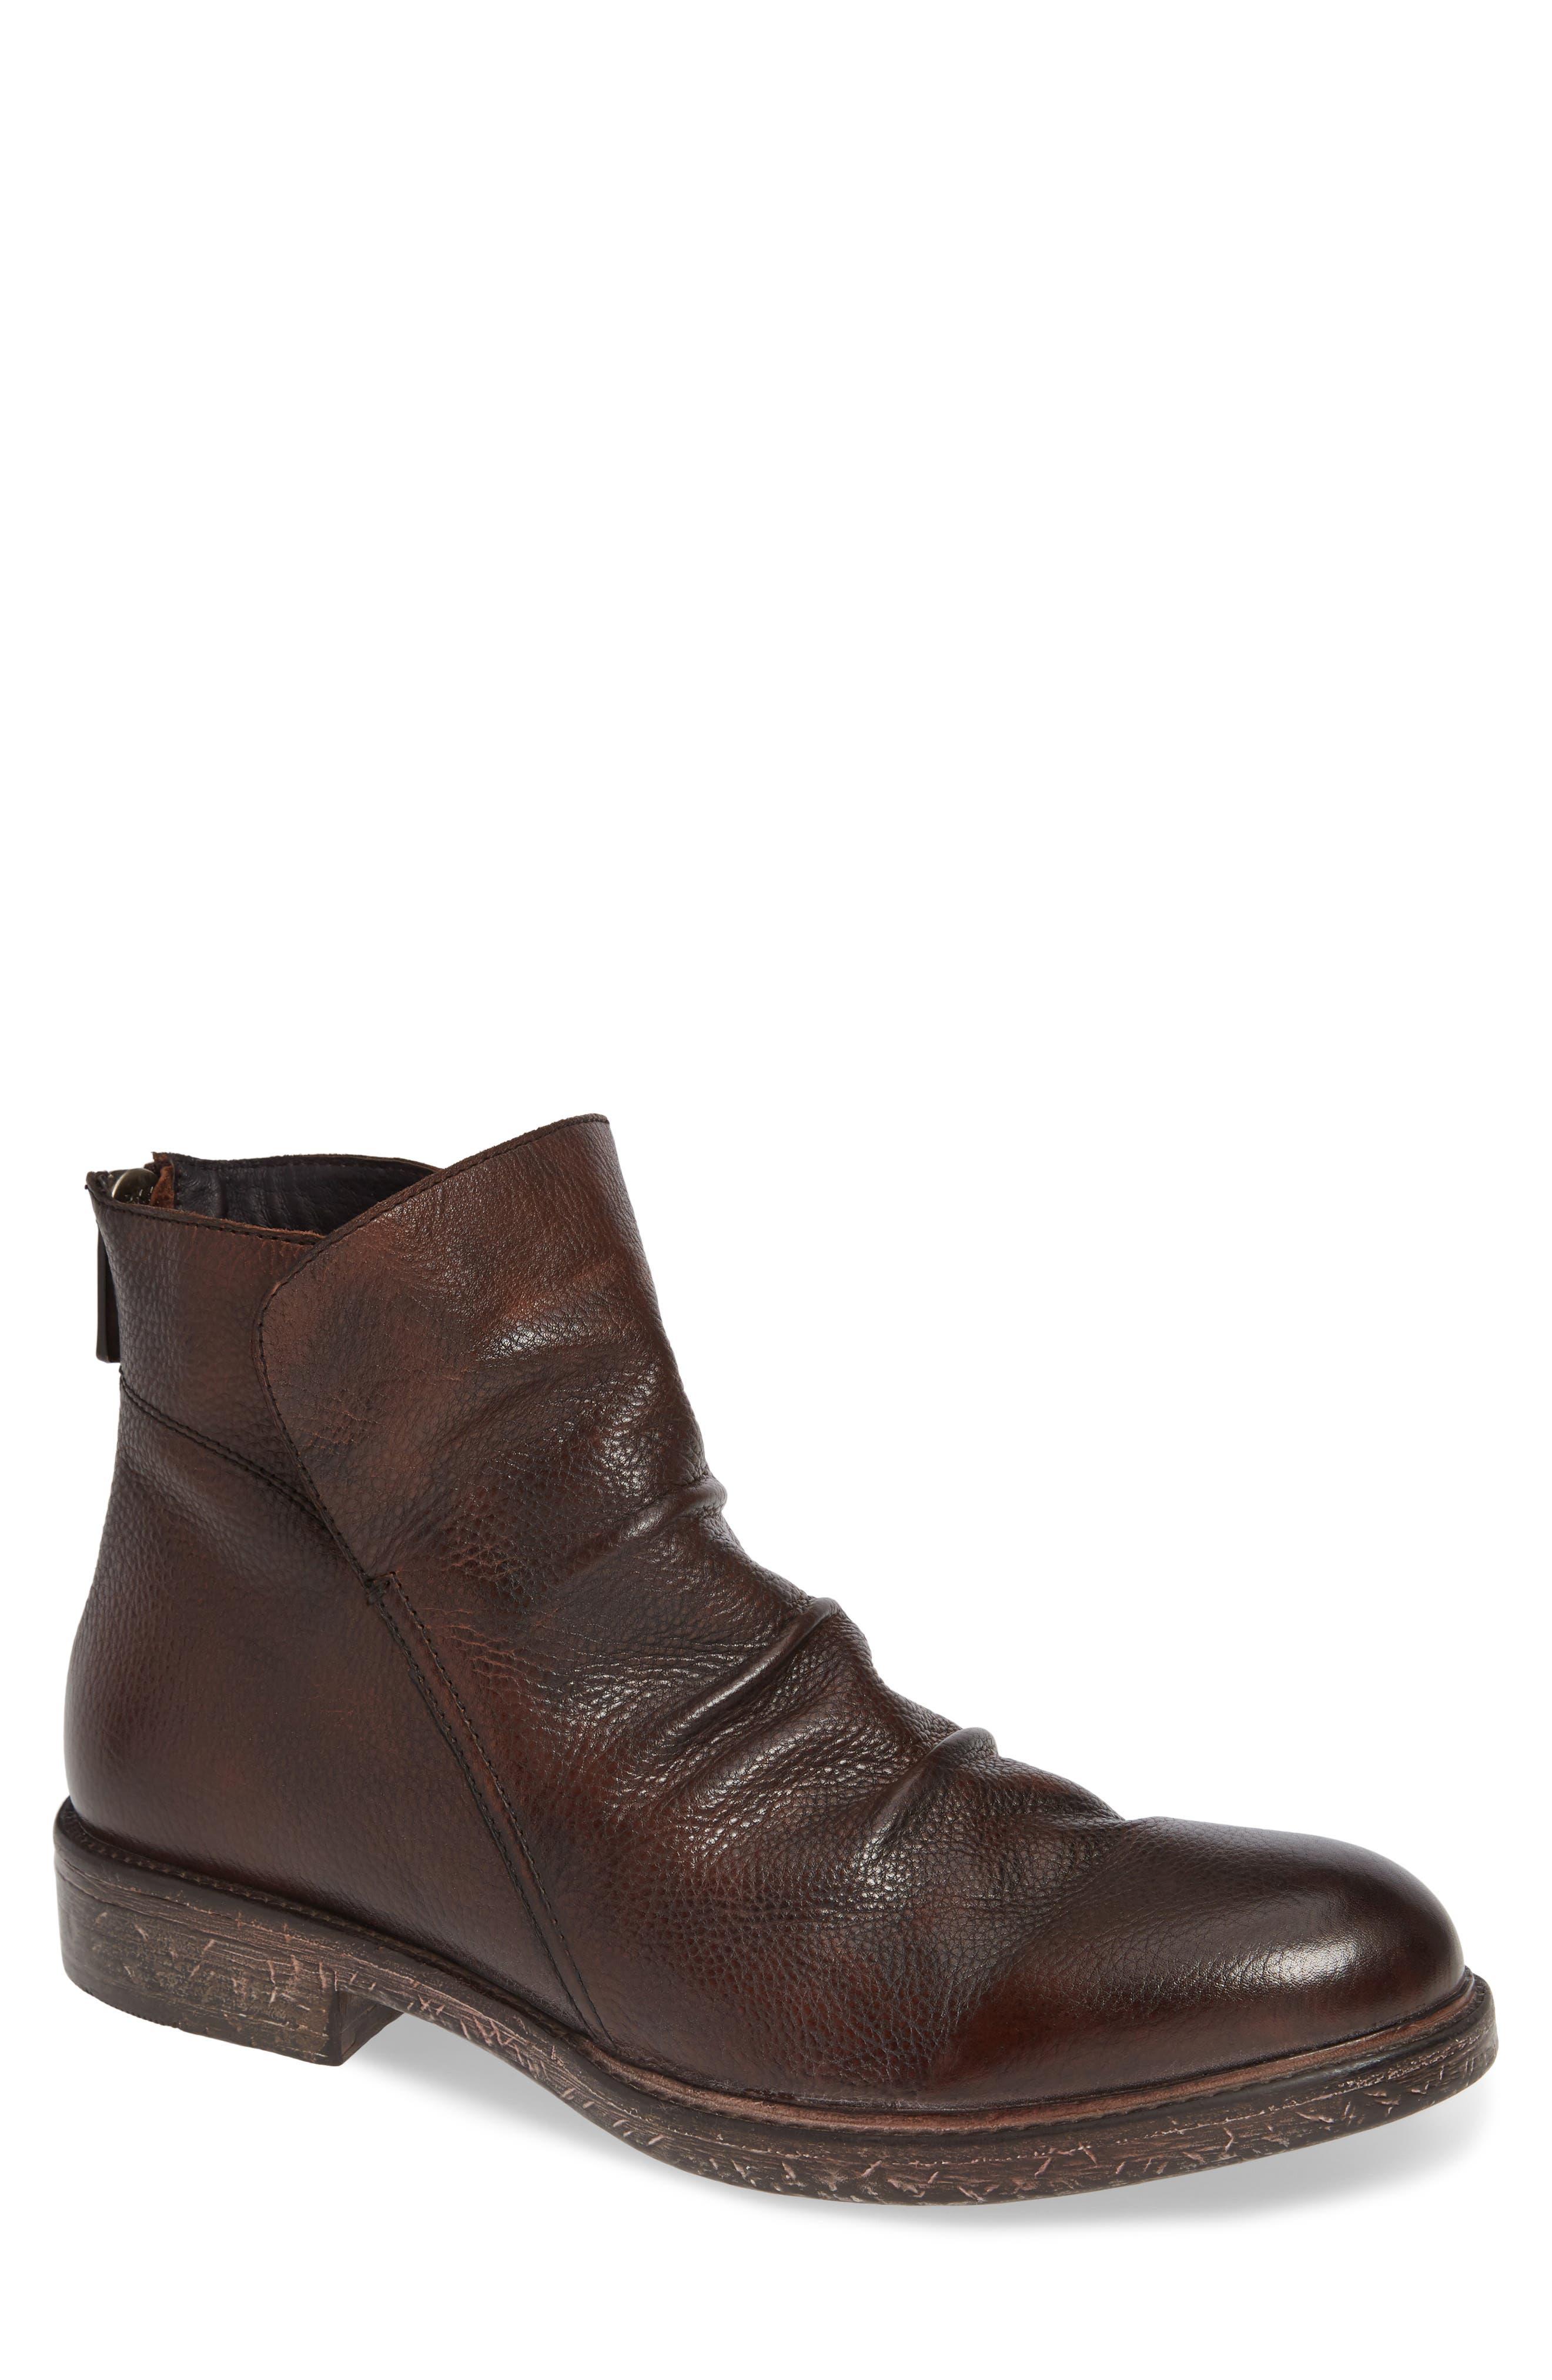 JUMP Pueblo Slouchy Boot, Main, color, BROWN